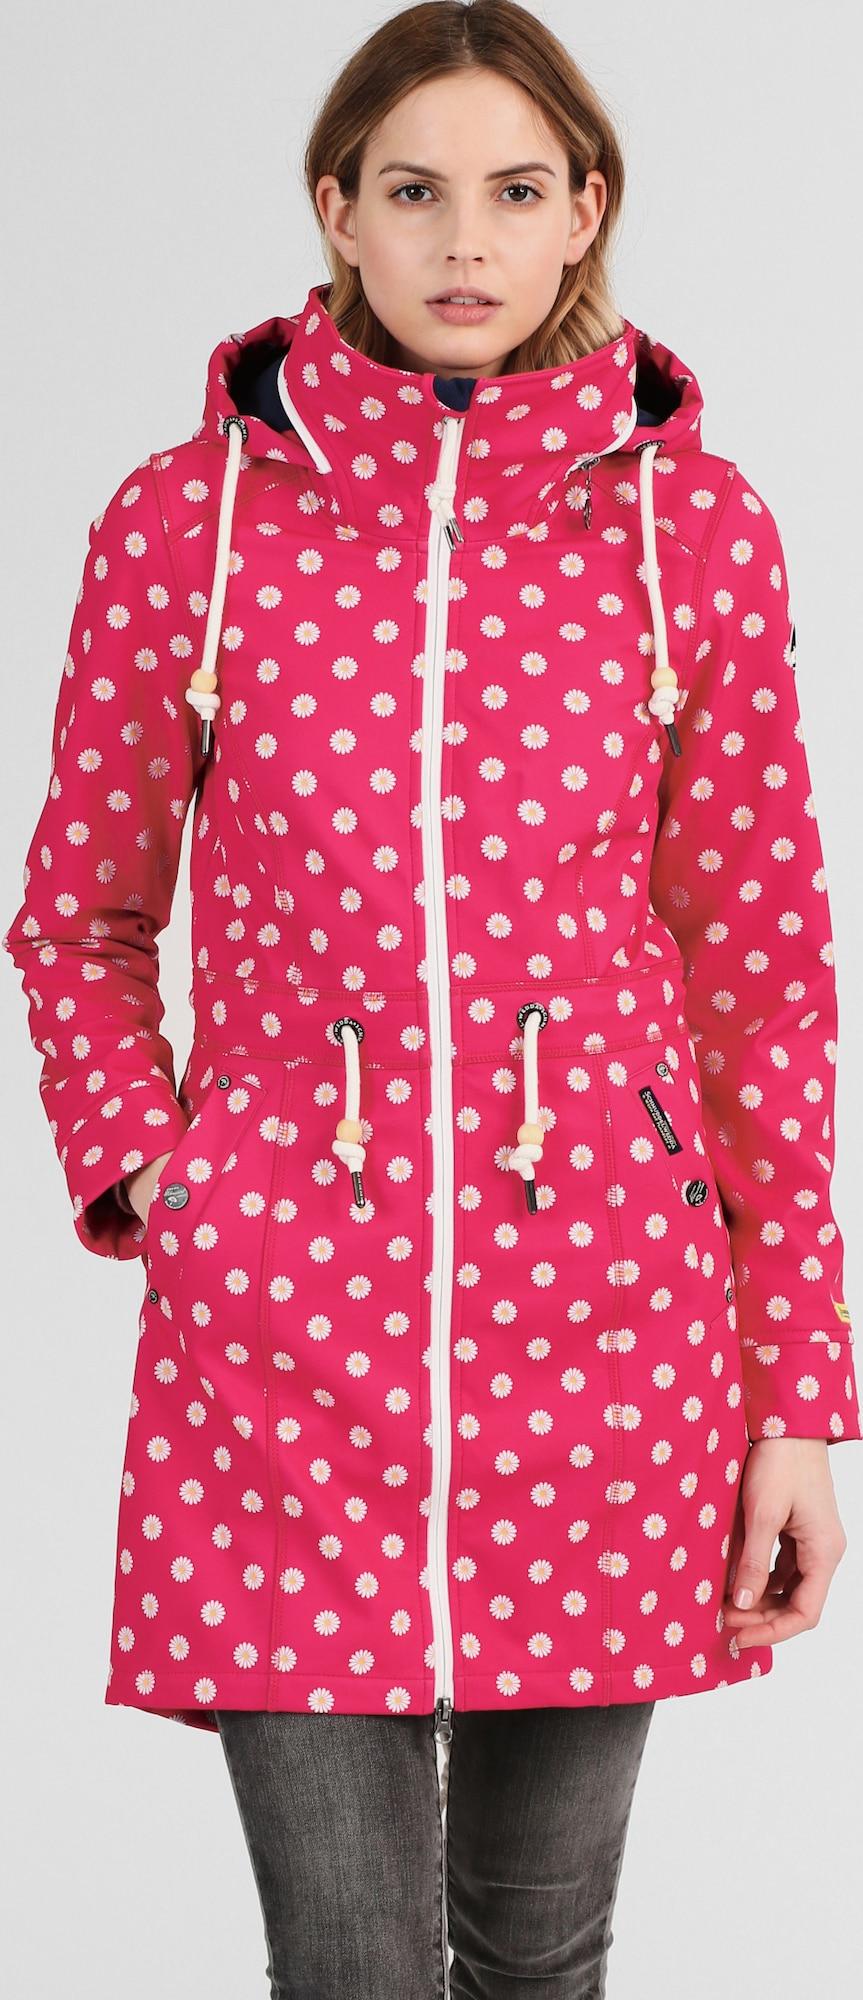 schmuddelwedda schmuddelwedda damen parka in pink about you. Black Bedroom Furniture Sets. Home Design Ideas